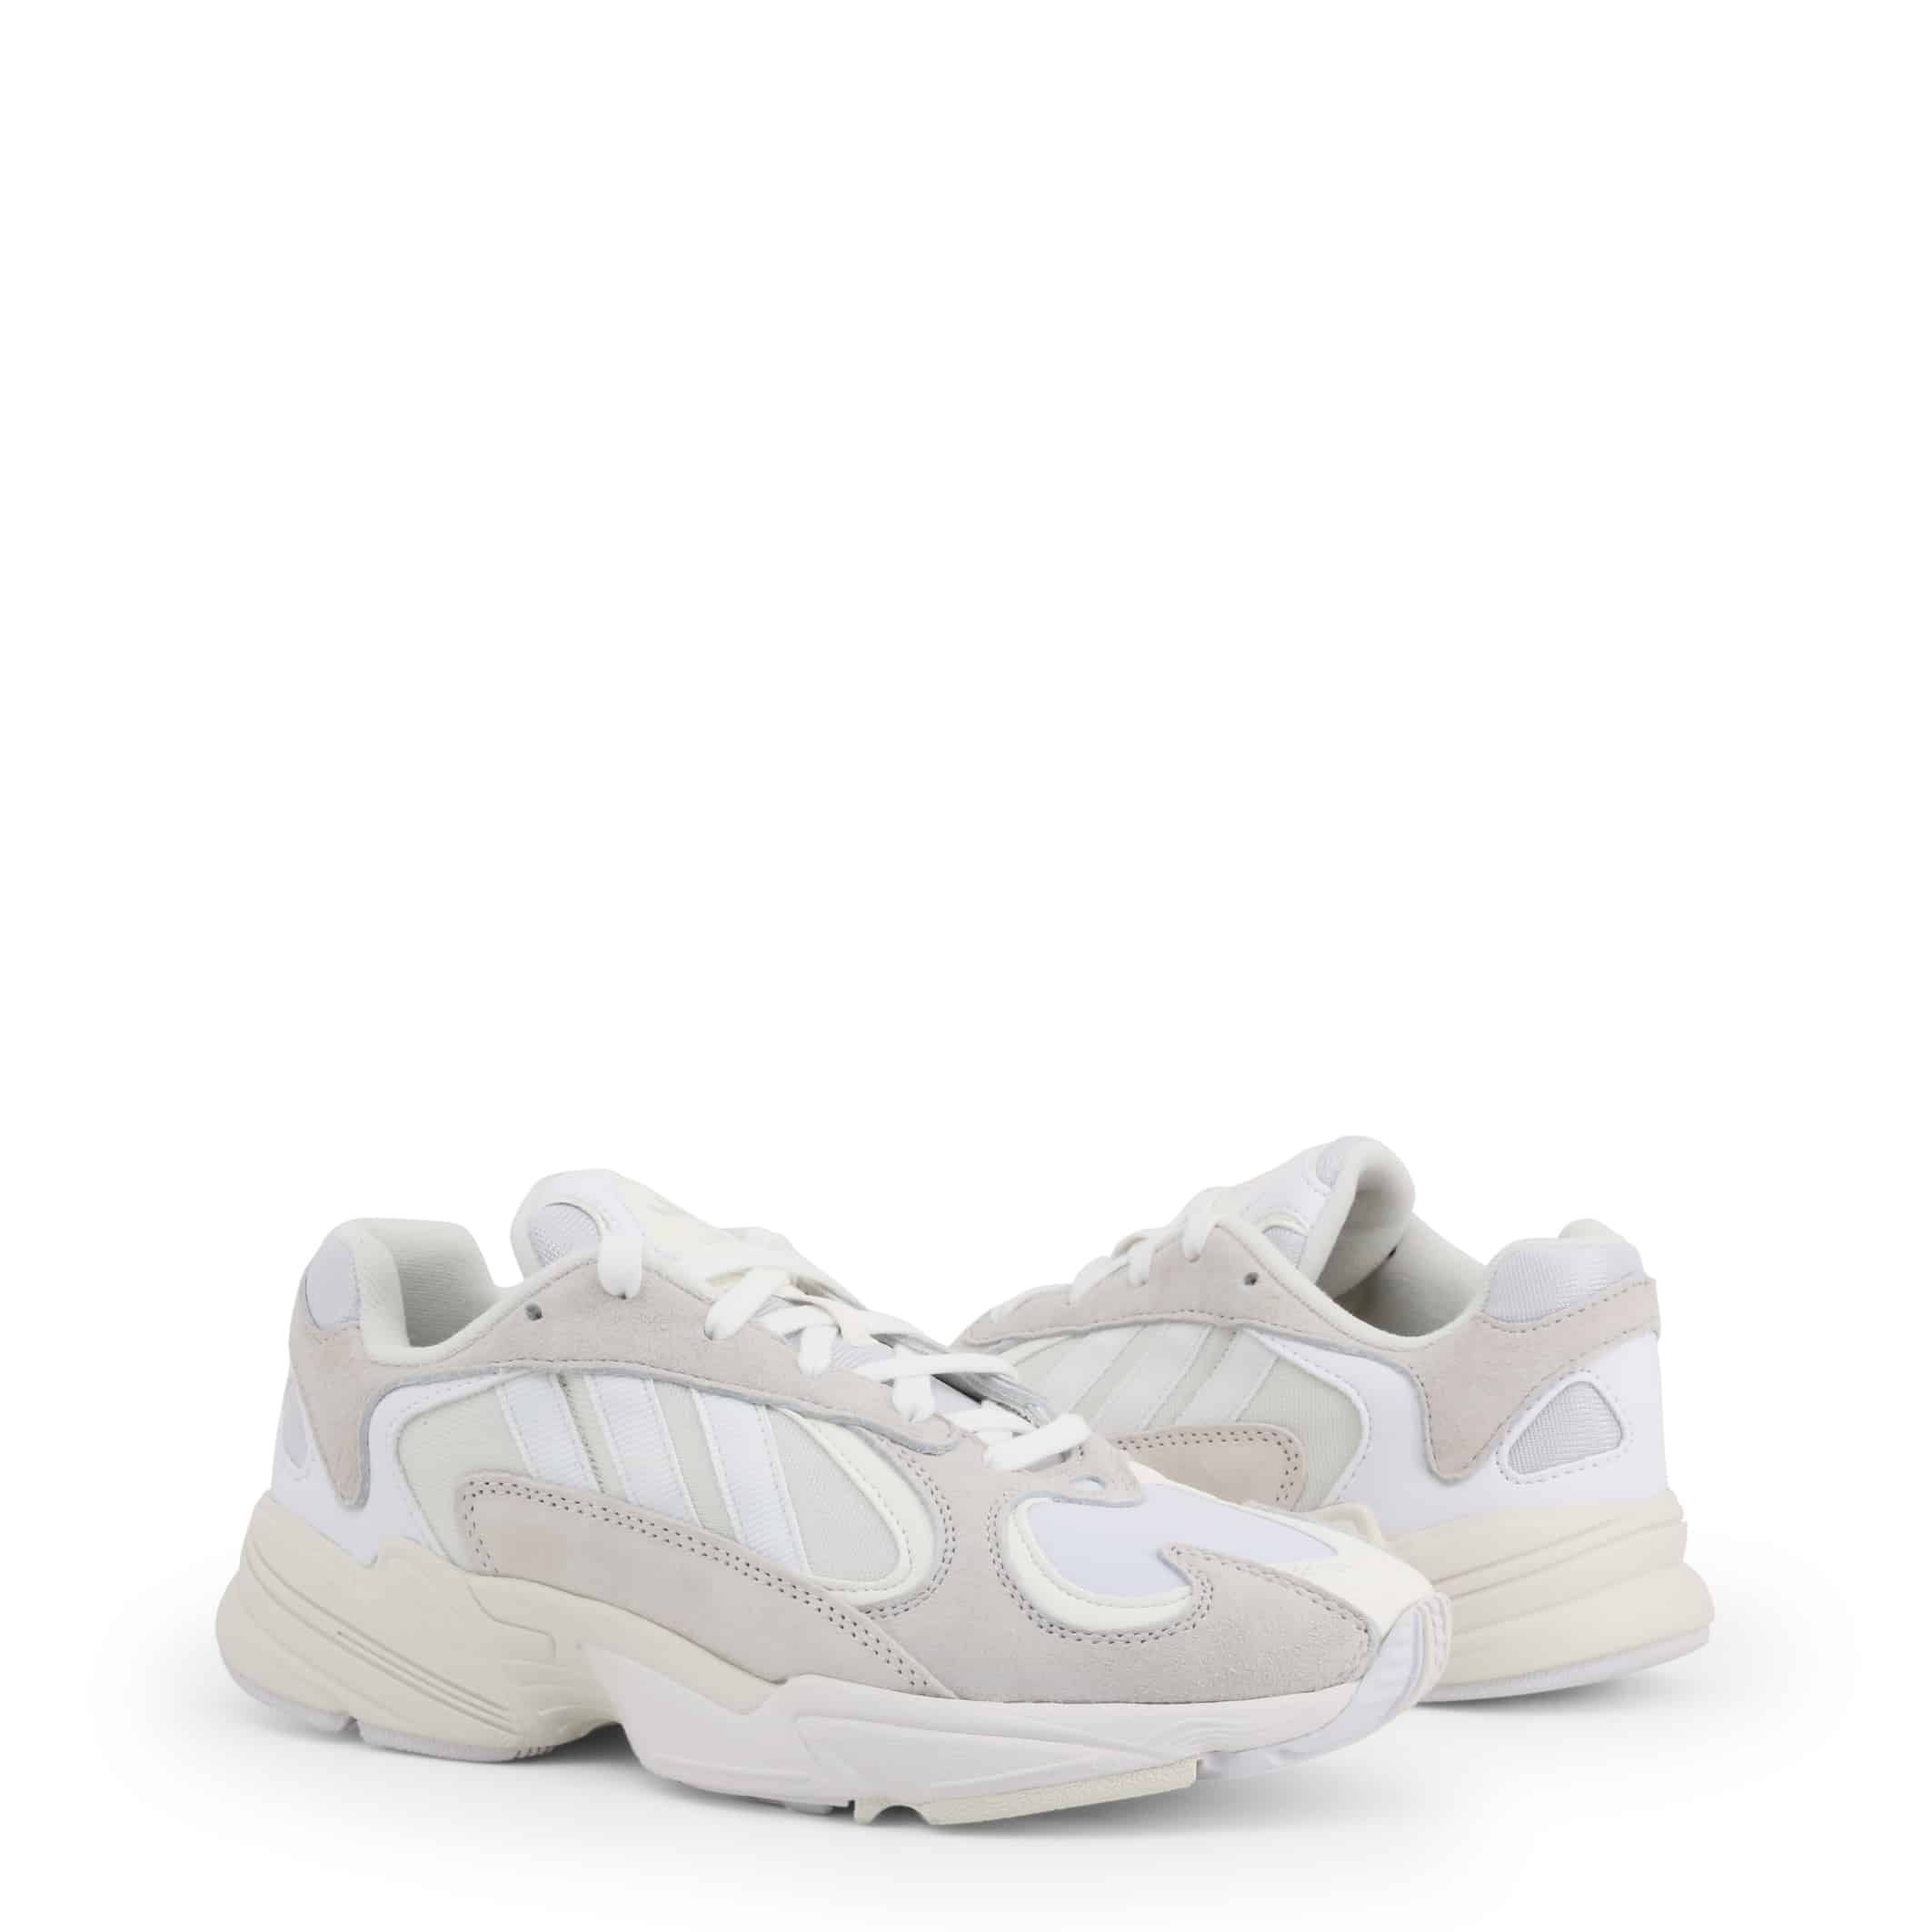 Adidas – YUNG-1 – Bianco